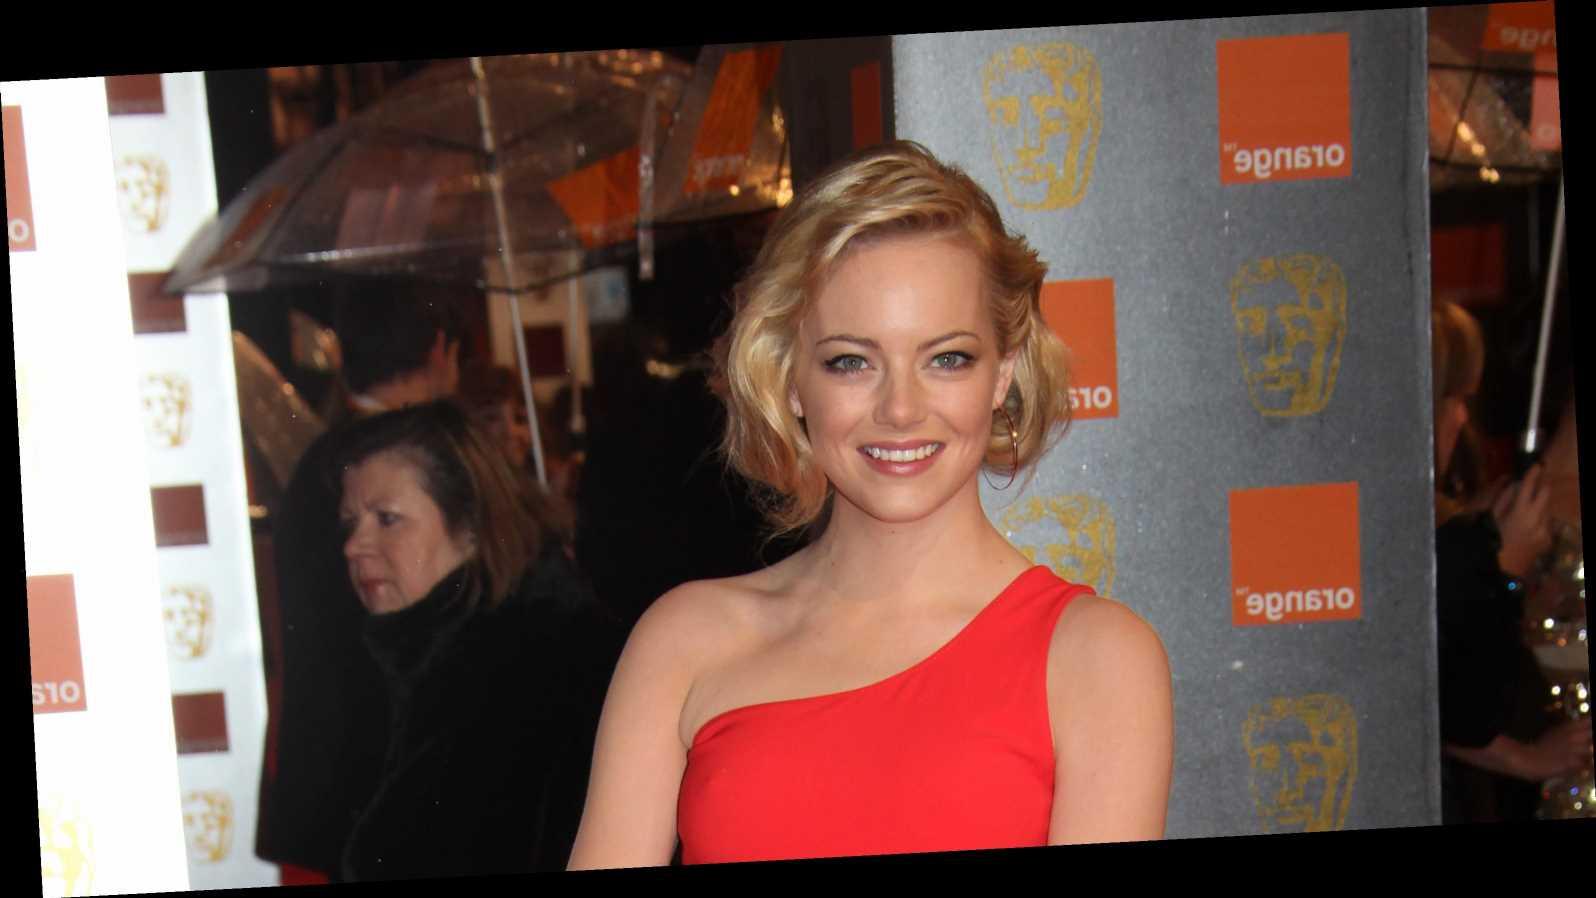 Fashion flashback to the 2011 BAFTAs